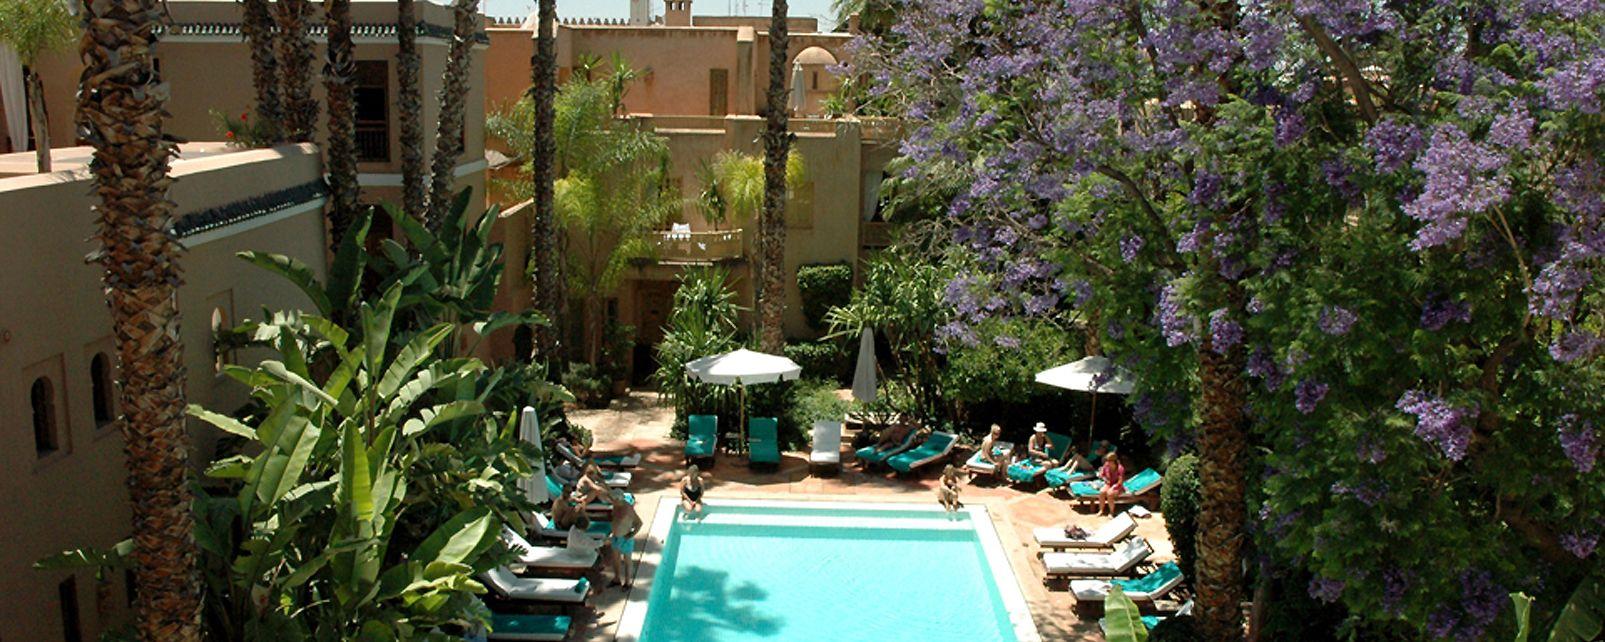 hotel les jardins de la m dina in marrakech. Black Bedroom Furniture Sets. Home Design Ideas